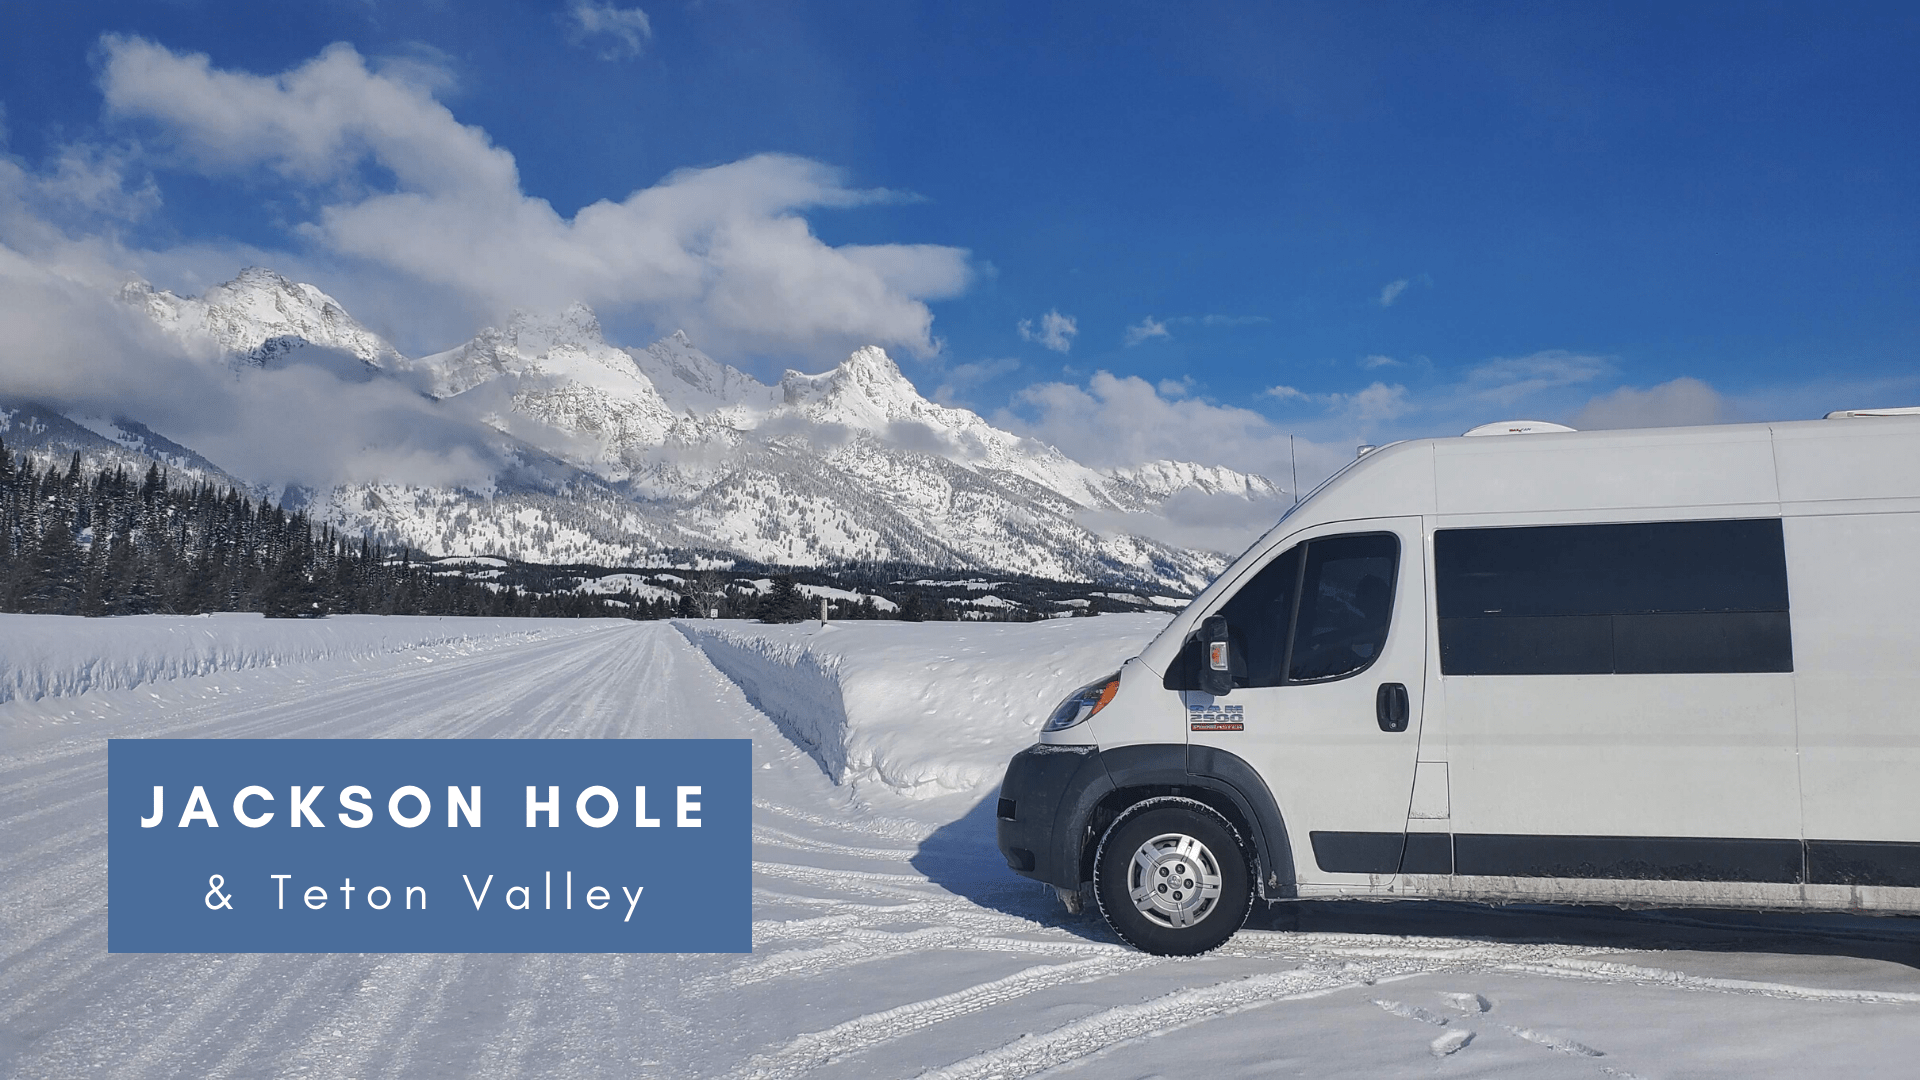 Jackson Hole & Teton Valley